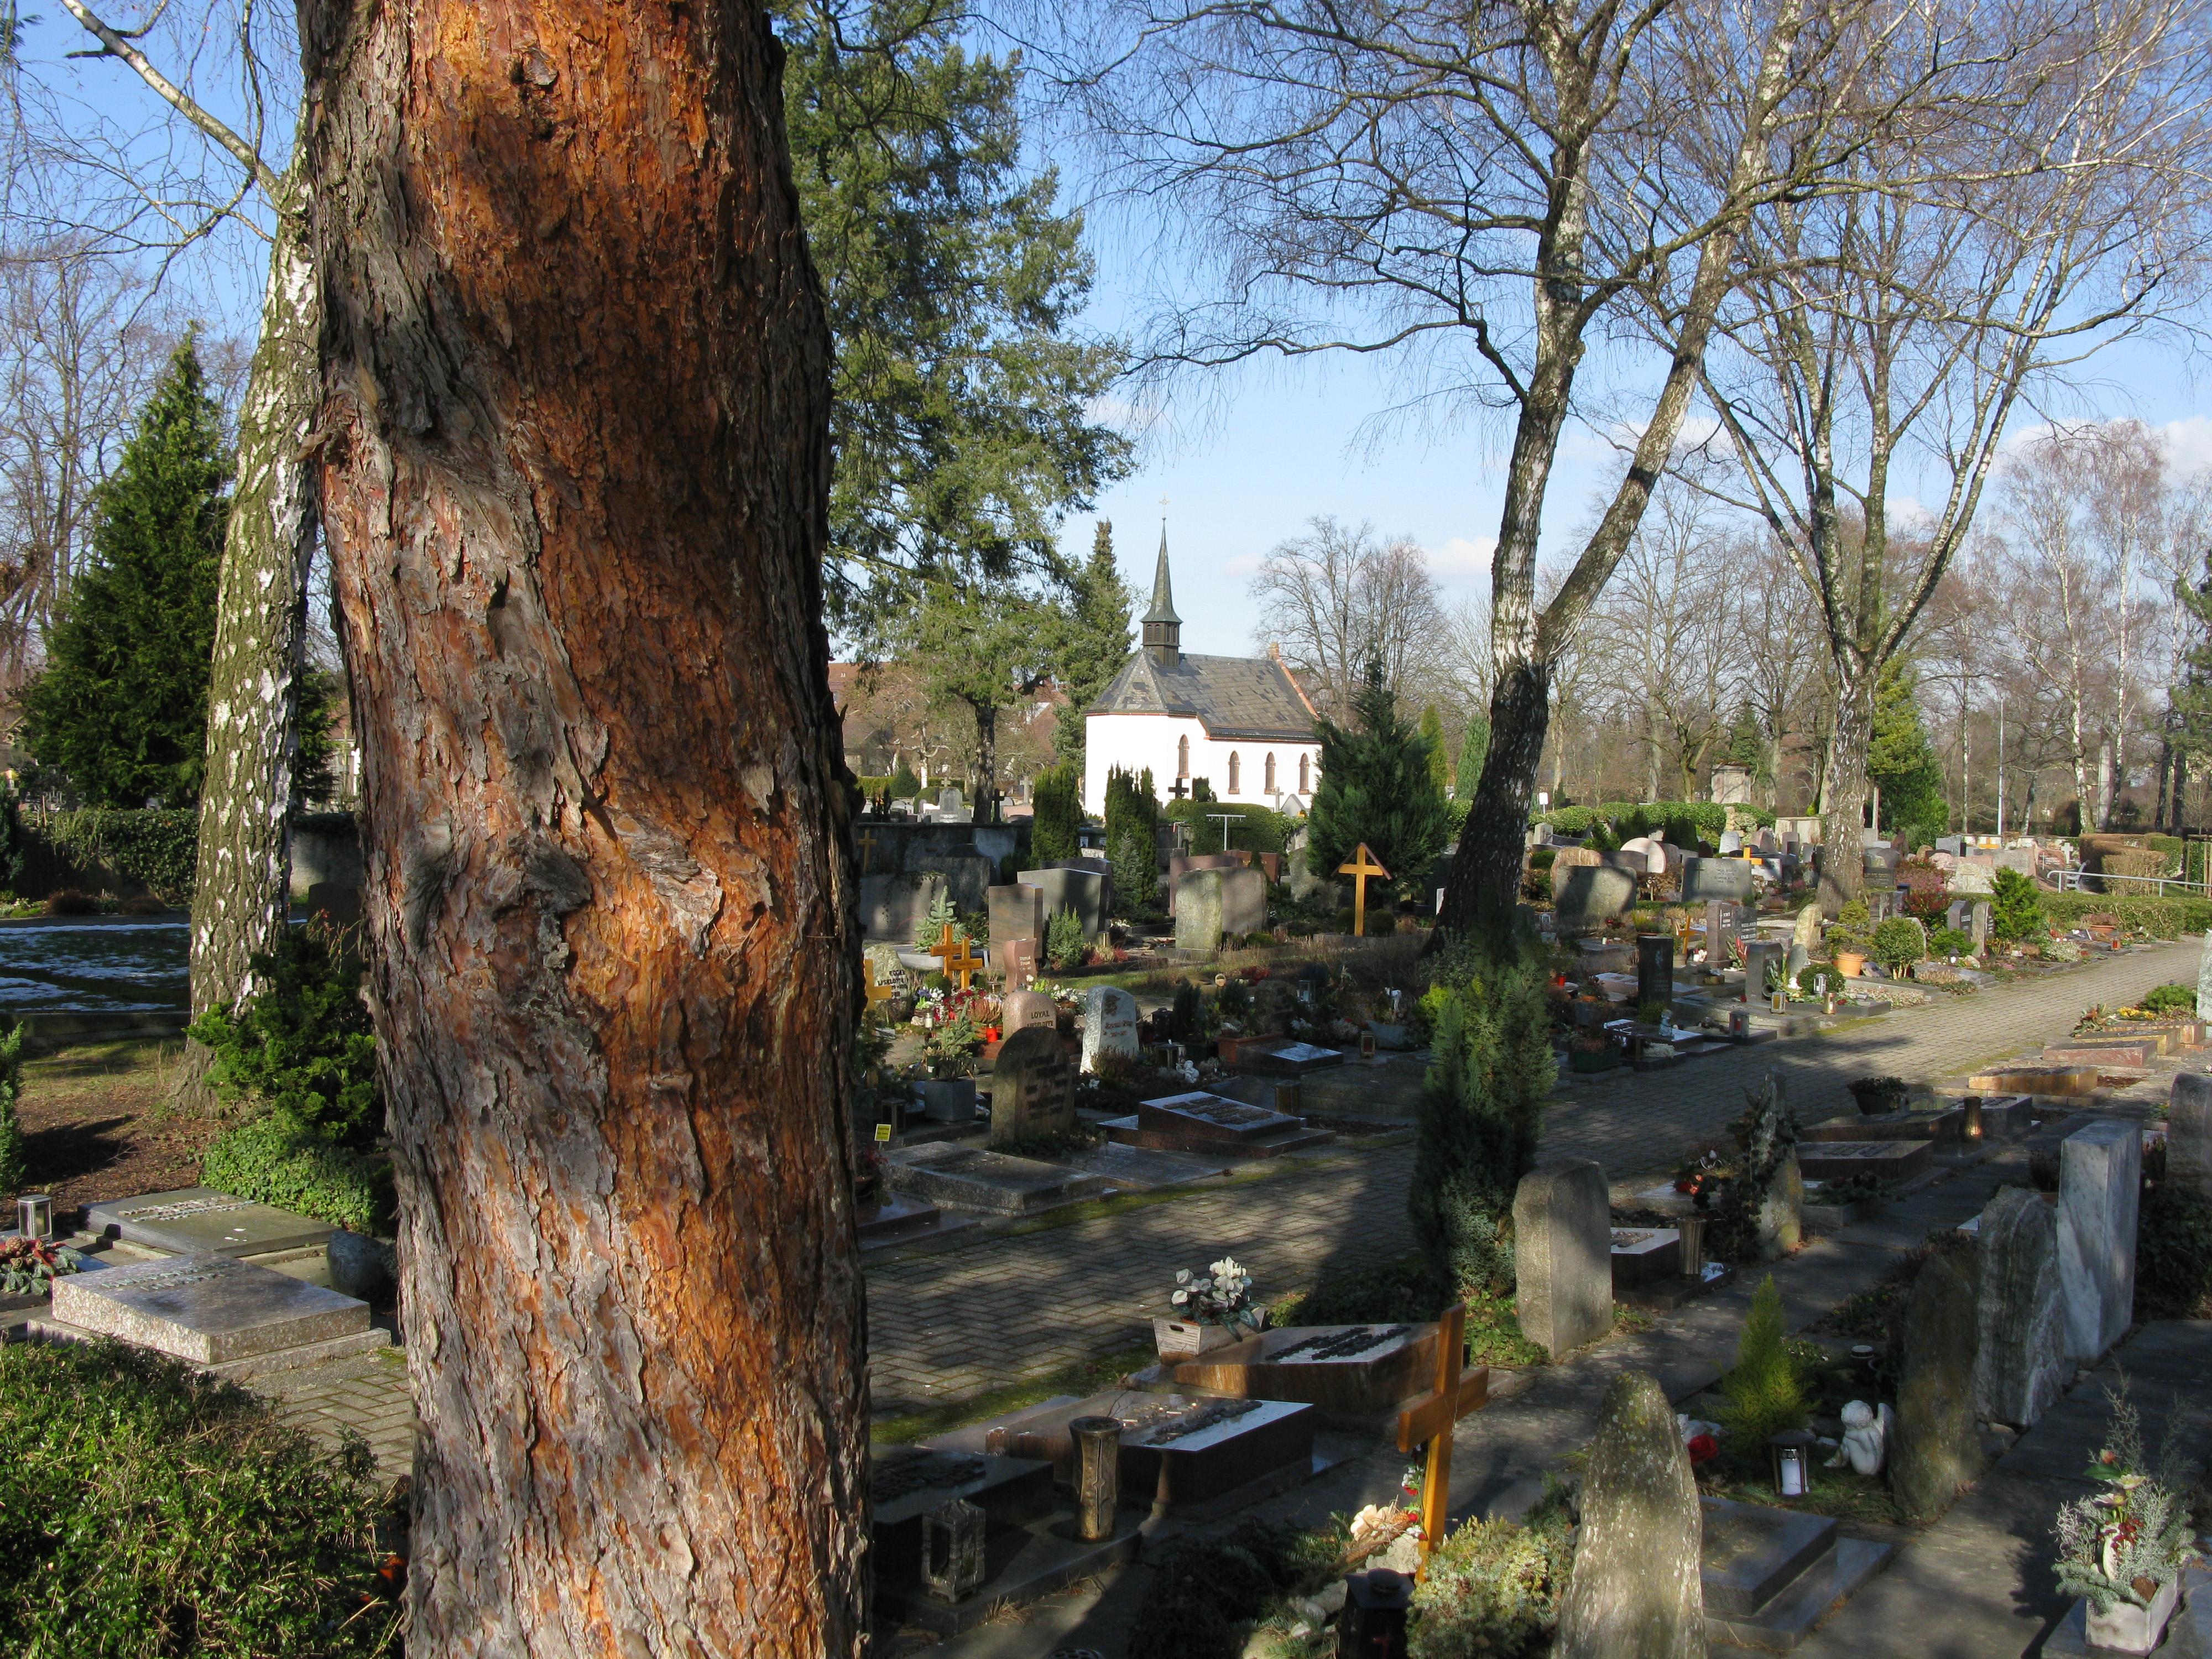 File:Friedhof Bad Krozingen 2.jpg - Wikimedia Commons